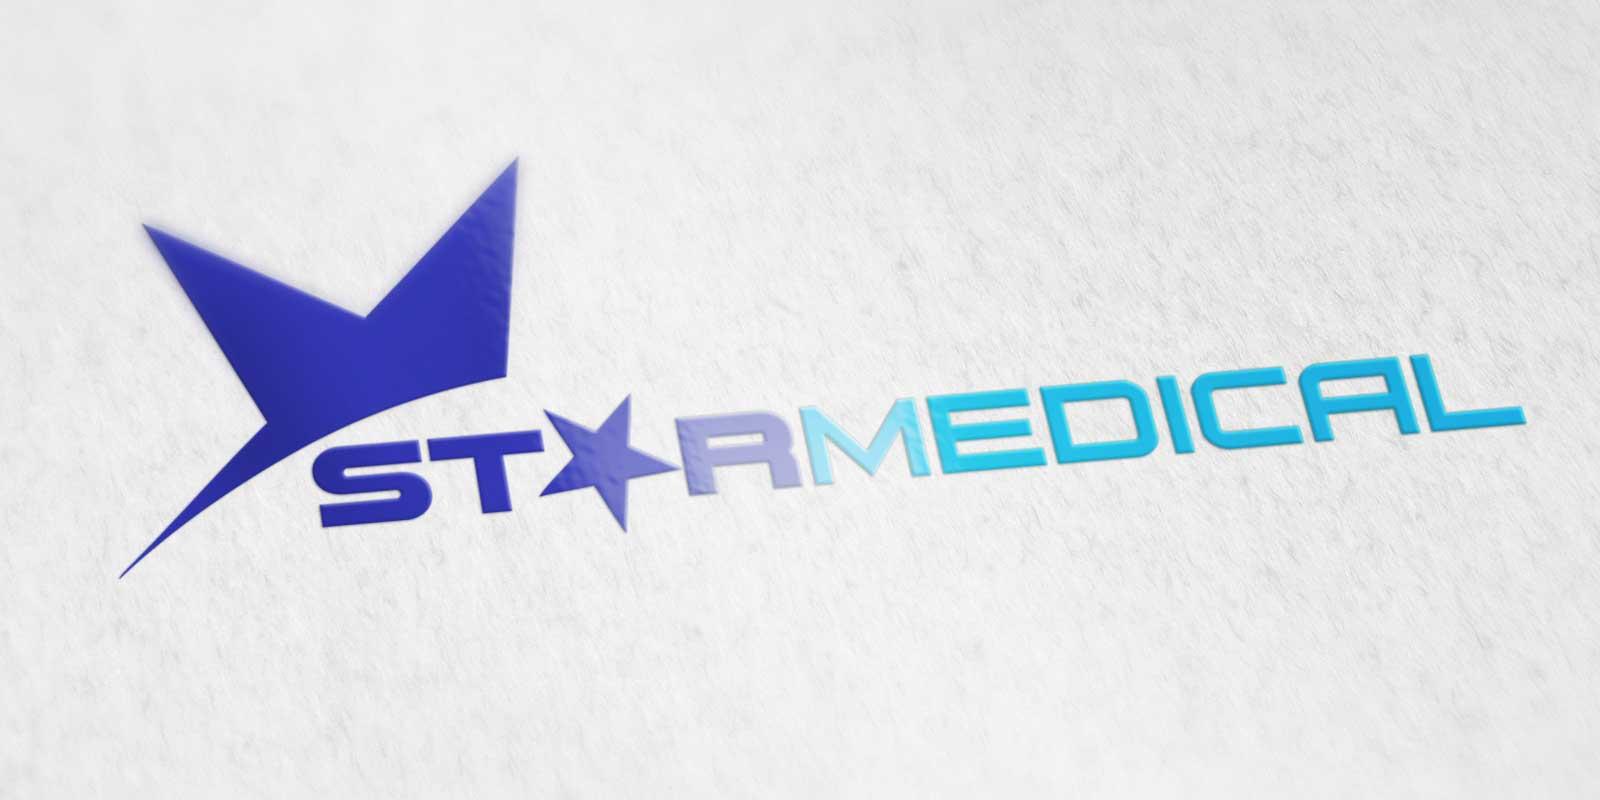 star-Wide-Logos